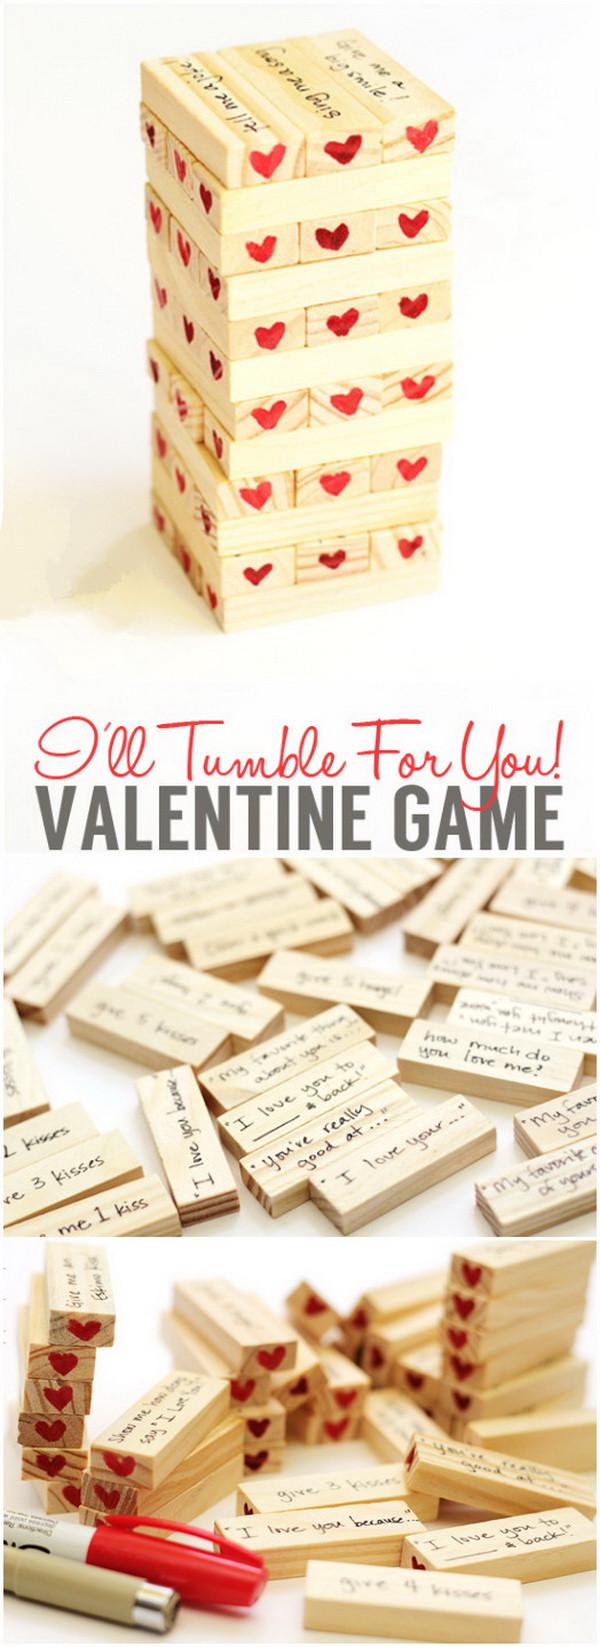 Valentines Gift Ideas For Boyfriends  Easy DIY Valentine s Day Gifts for Boyfriend Listing More